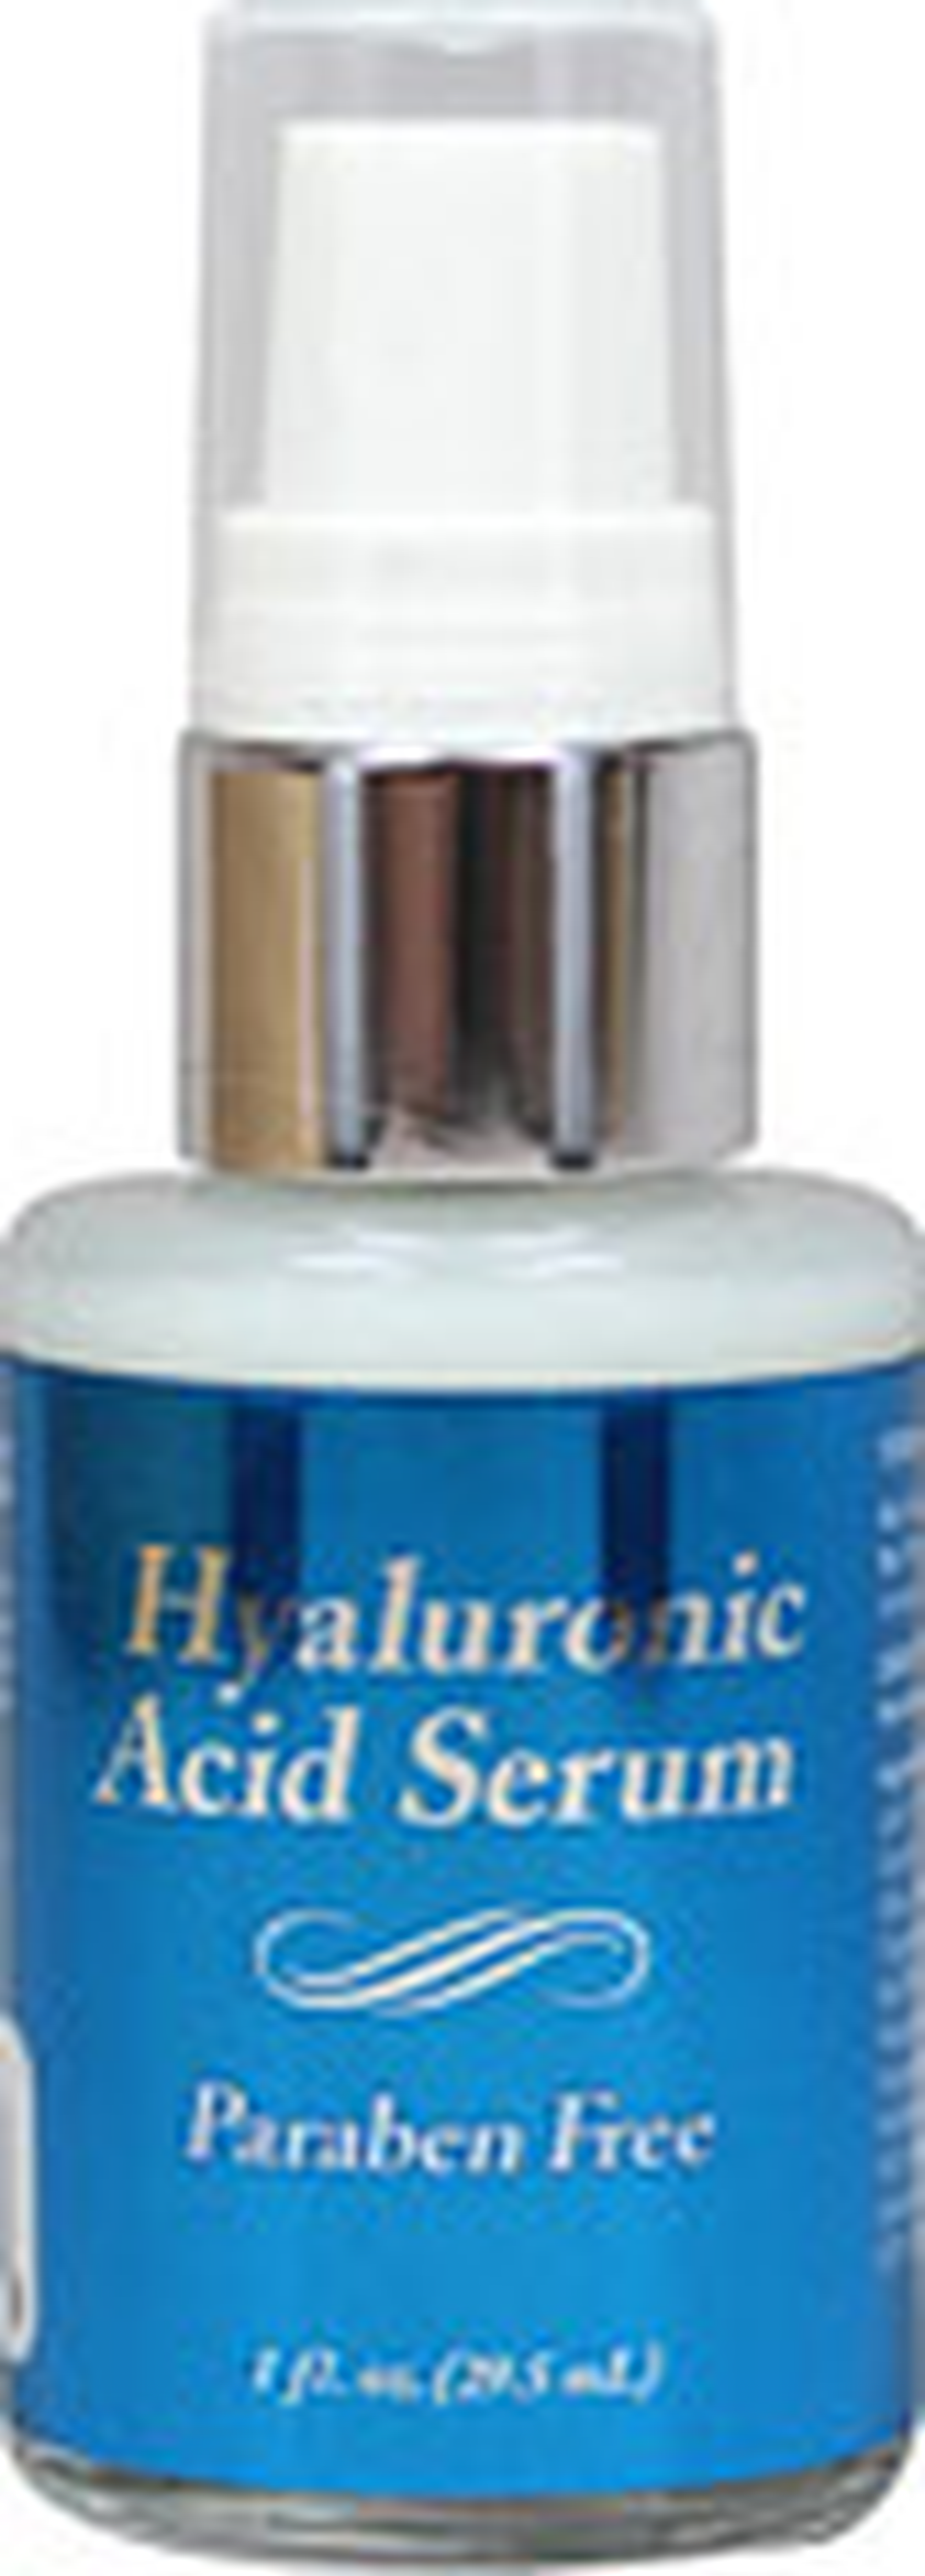 Hyaluronic Acid Serum  1 oz Serum  $9.99